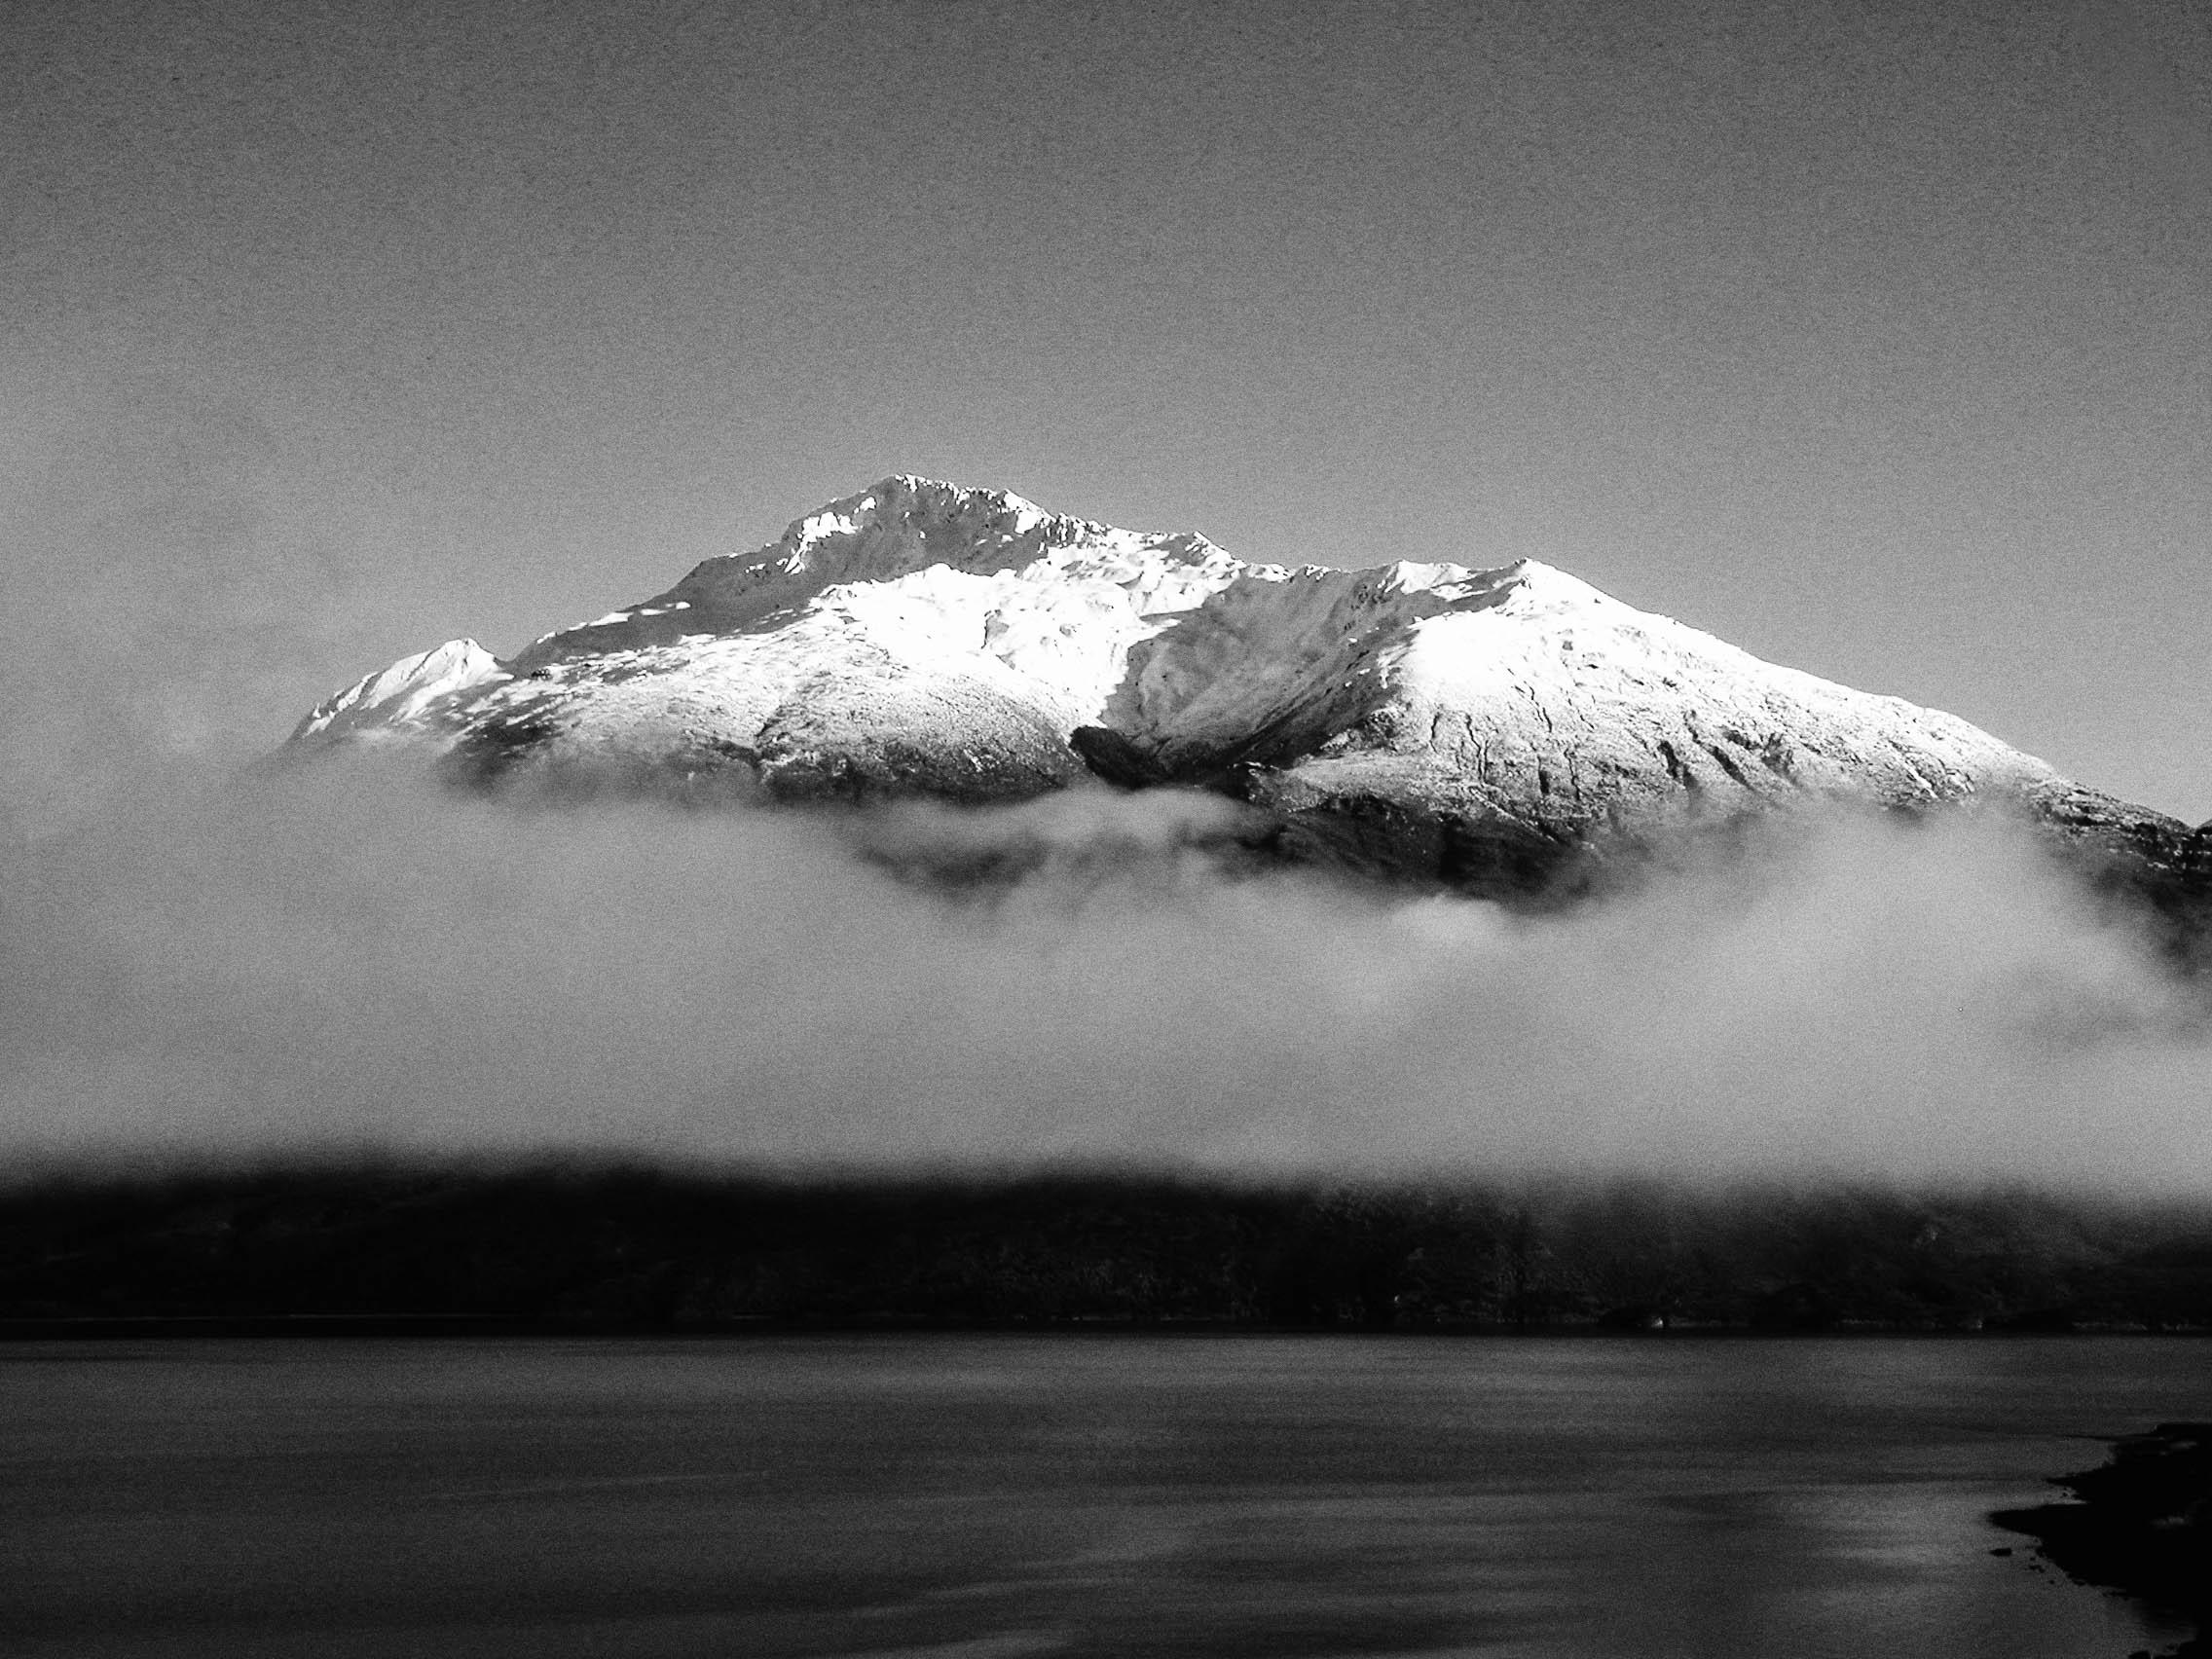 Early Monring Fog in Fiordland